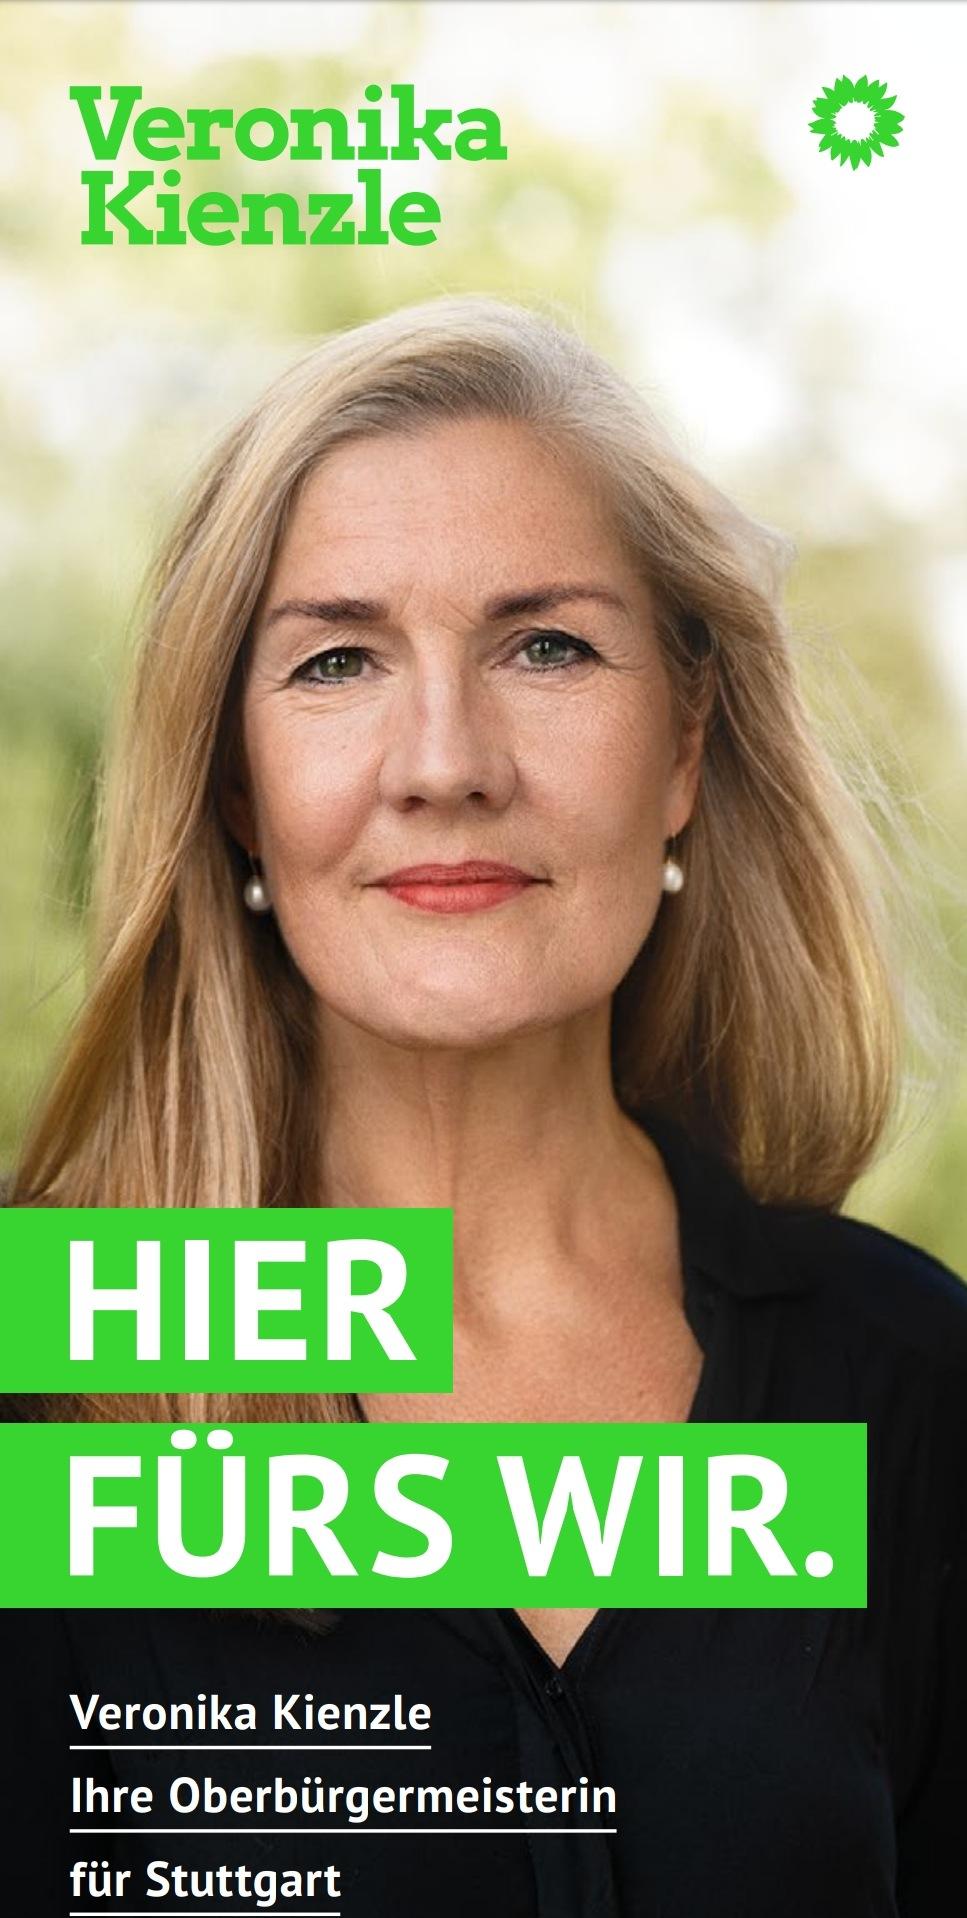 OB-Wahlkampf Flyer von Veronika Kienzle